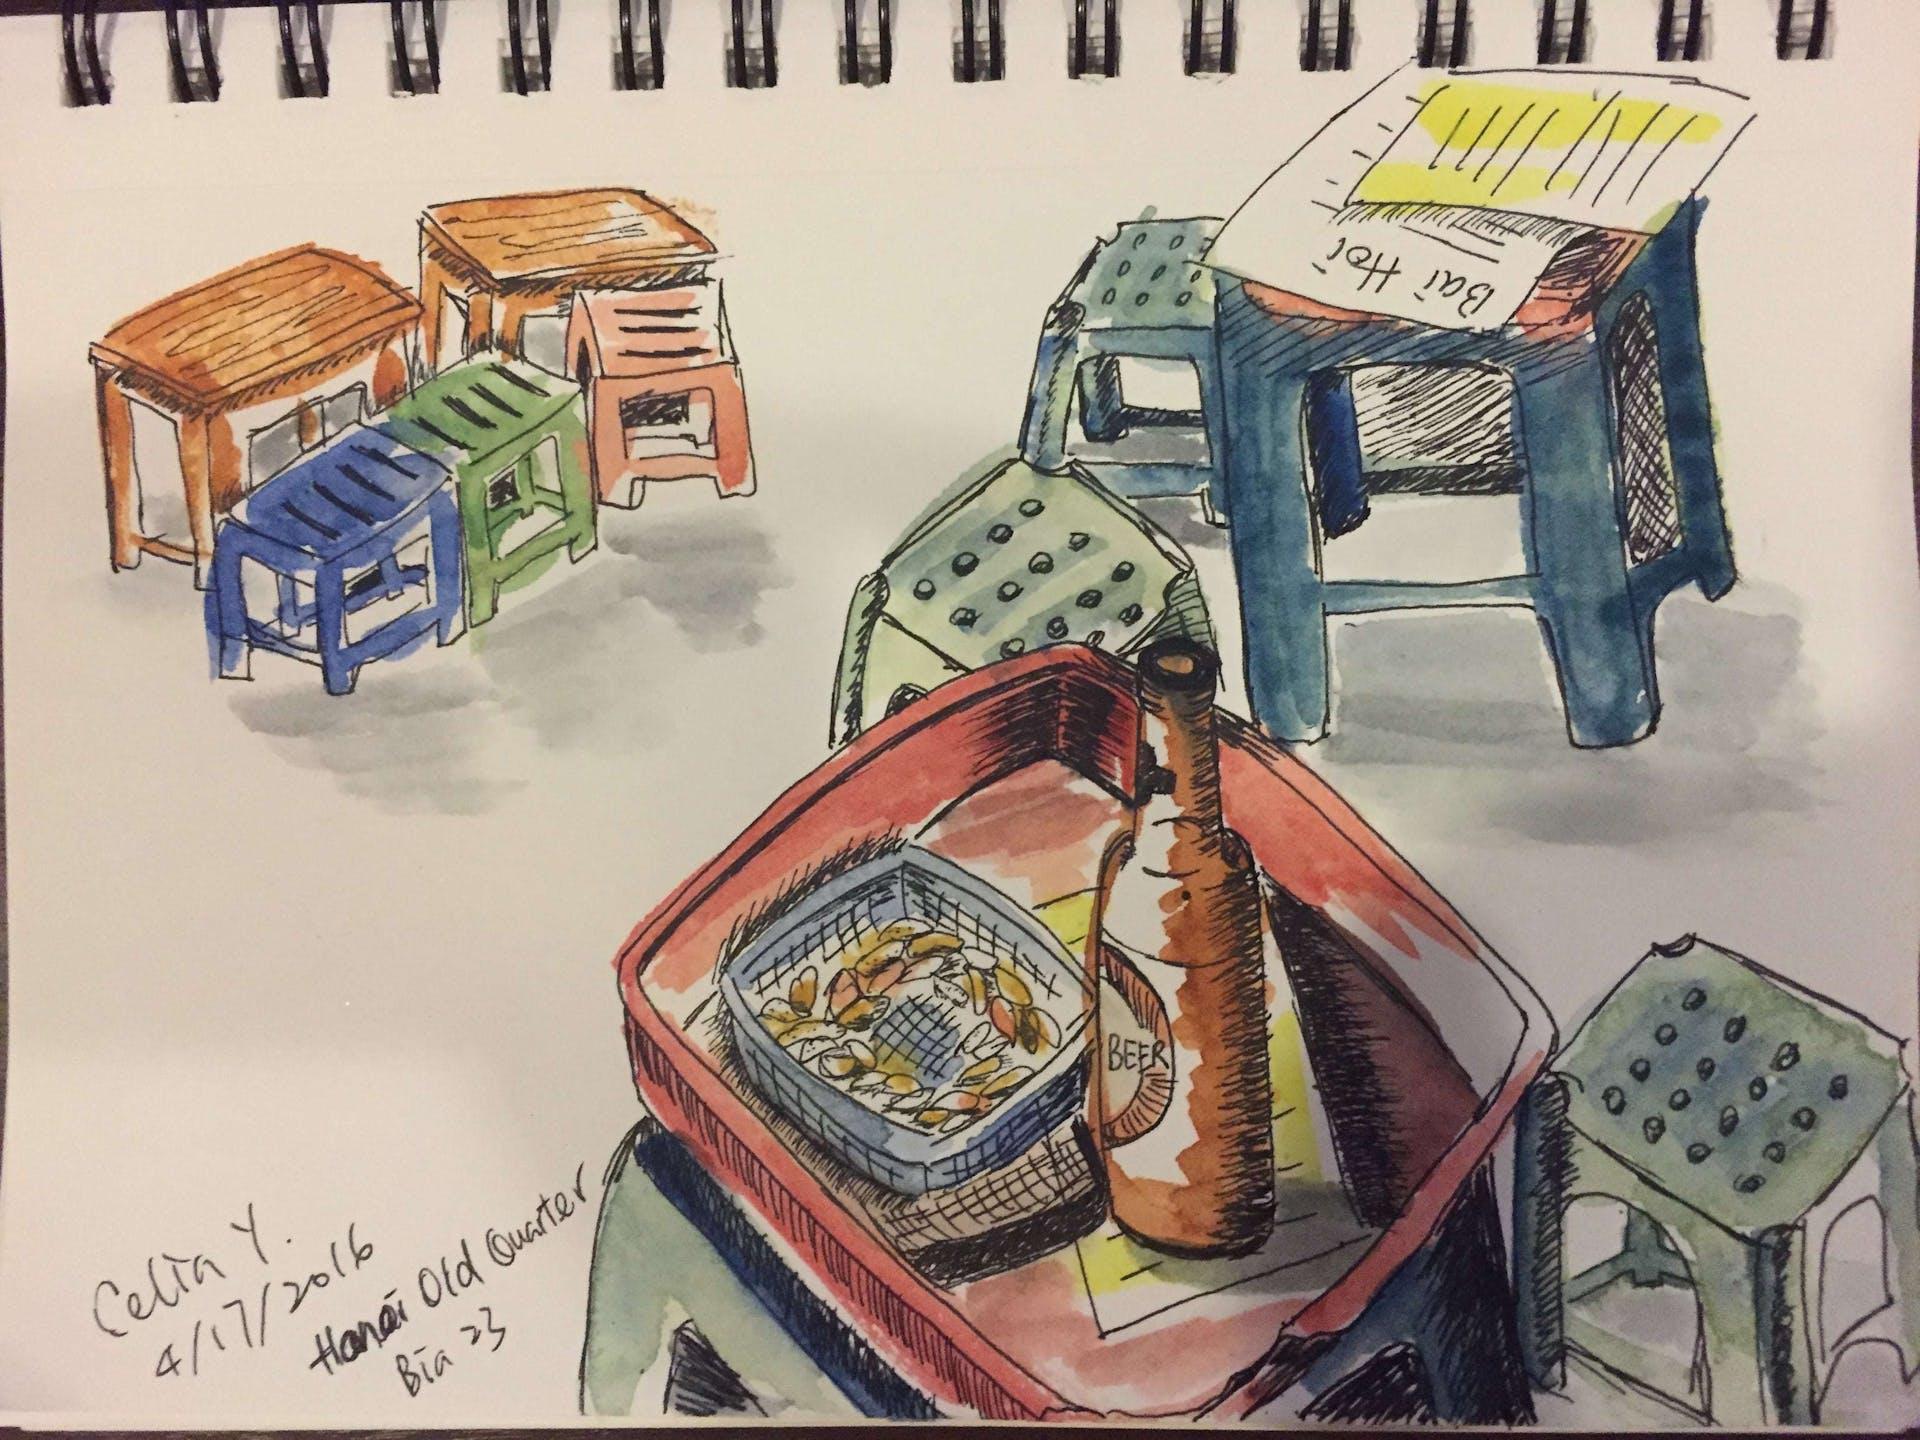 Celia's sketch of the Hanoi Old Quarter